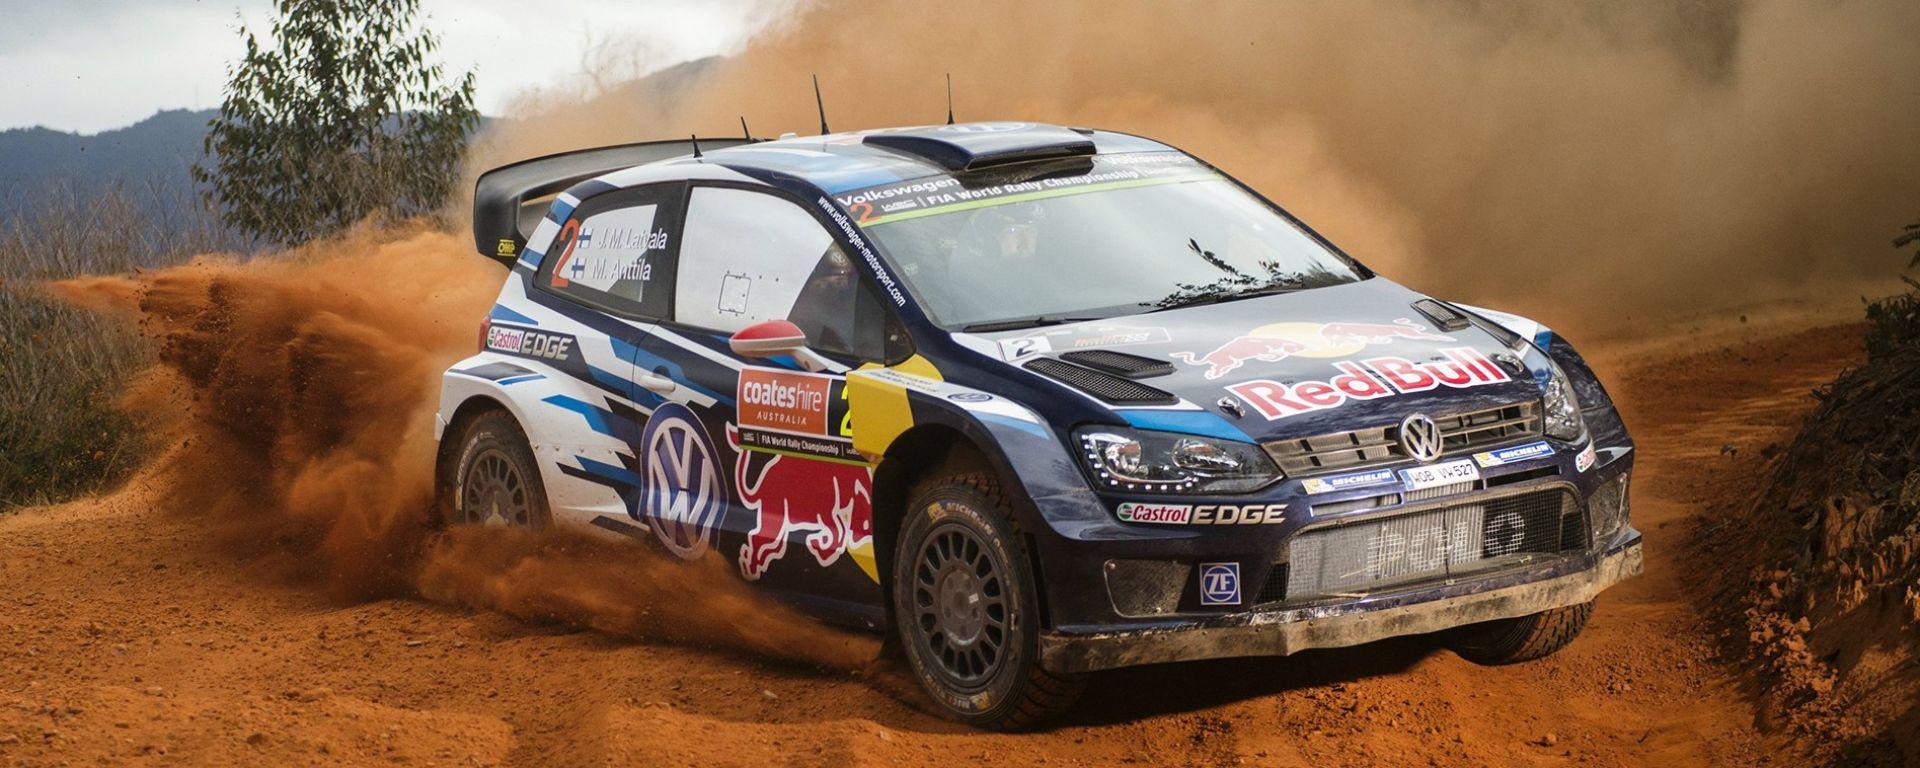 Polo R WRC - Rally Australia 2016